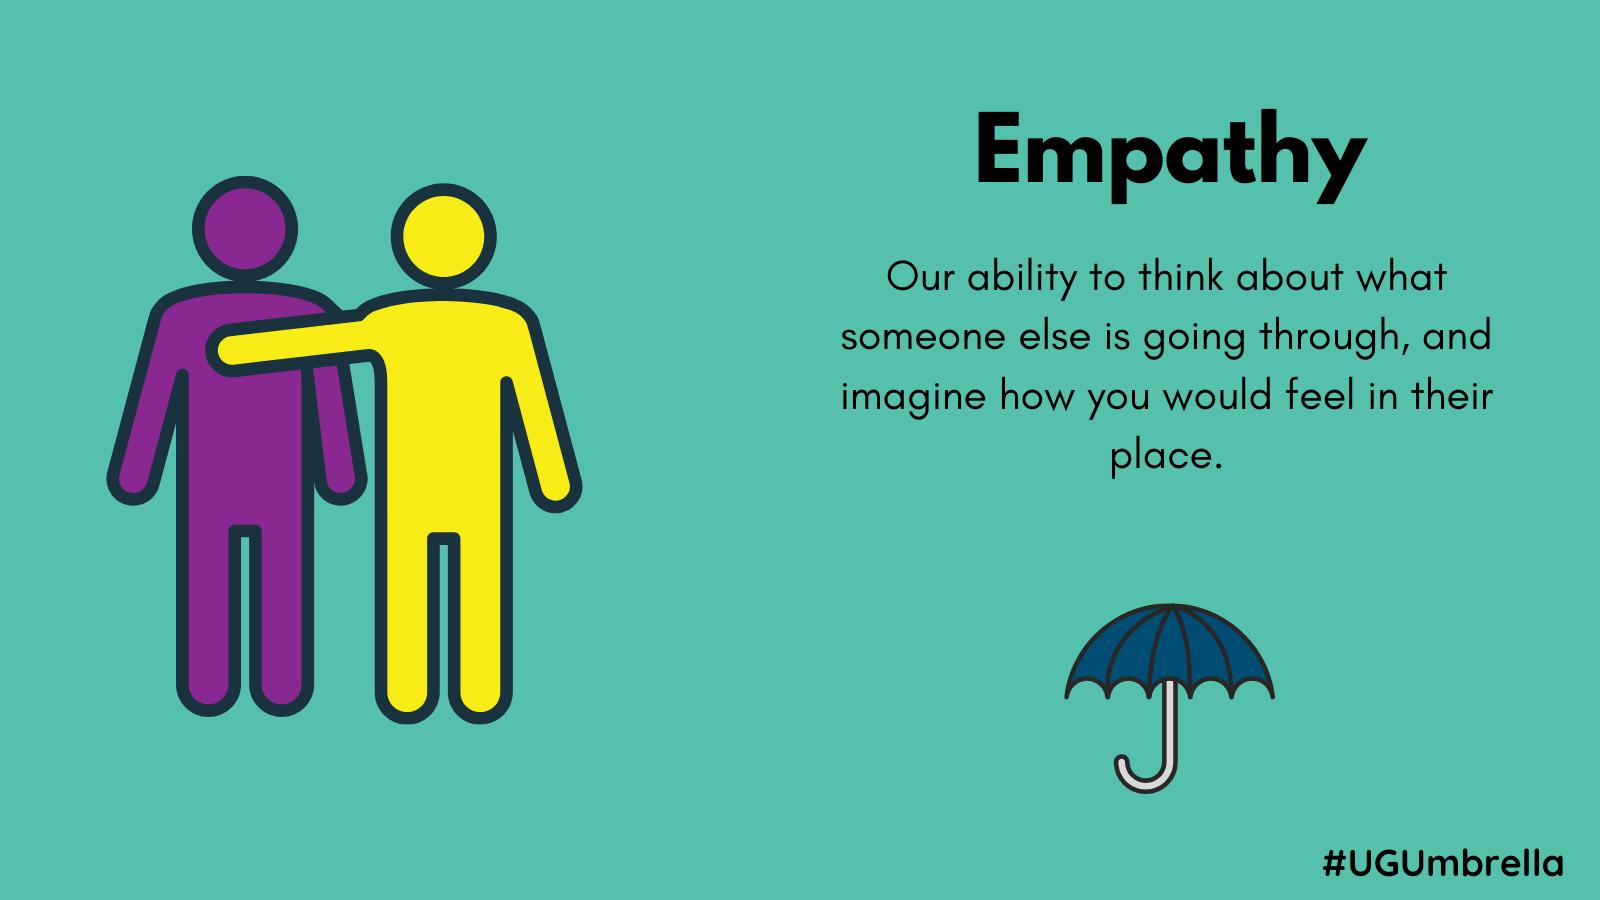 December Umbrella Project Photo describing empathy